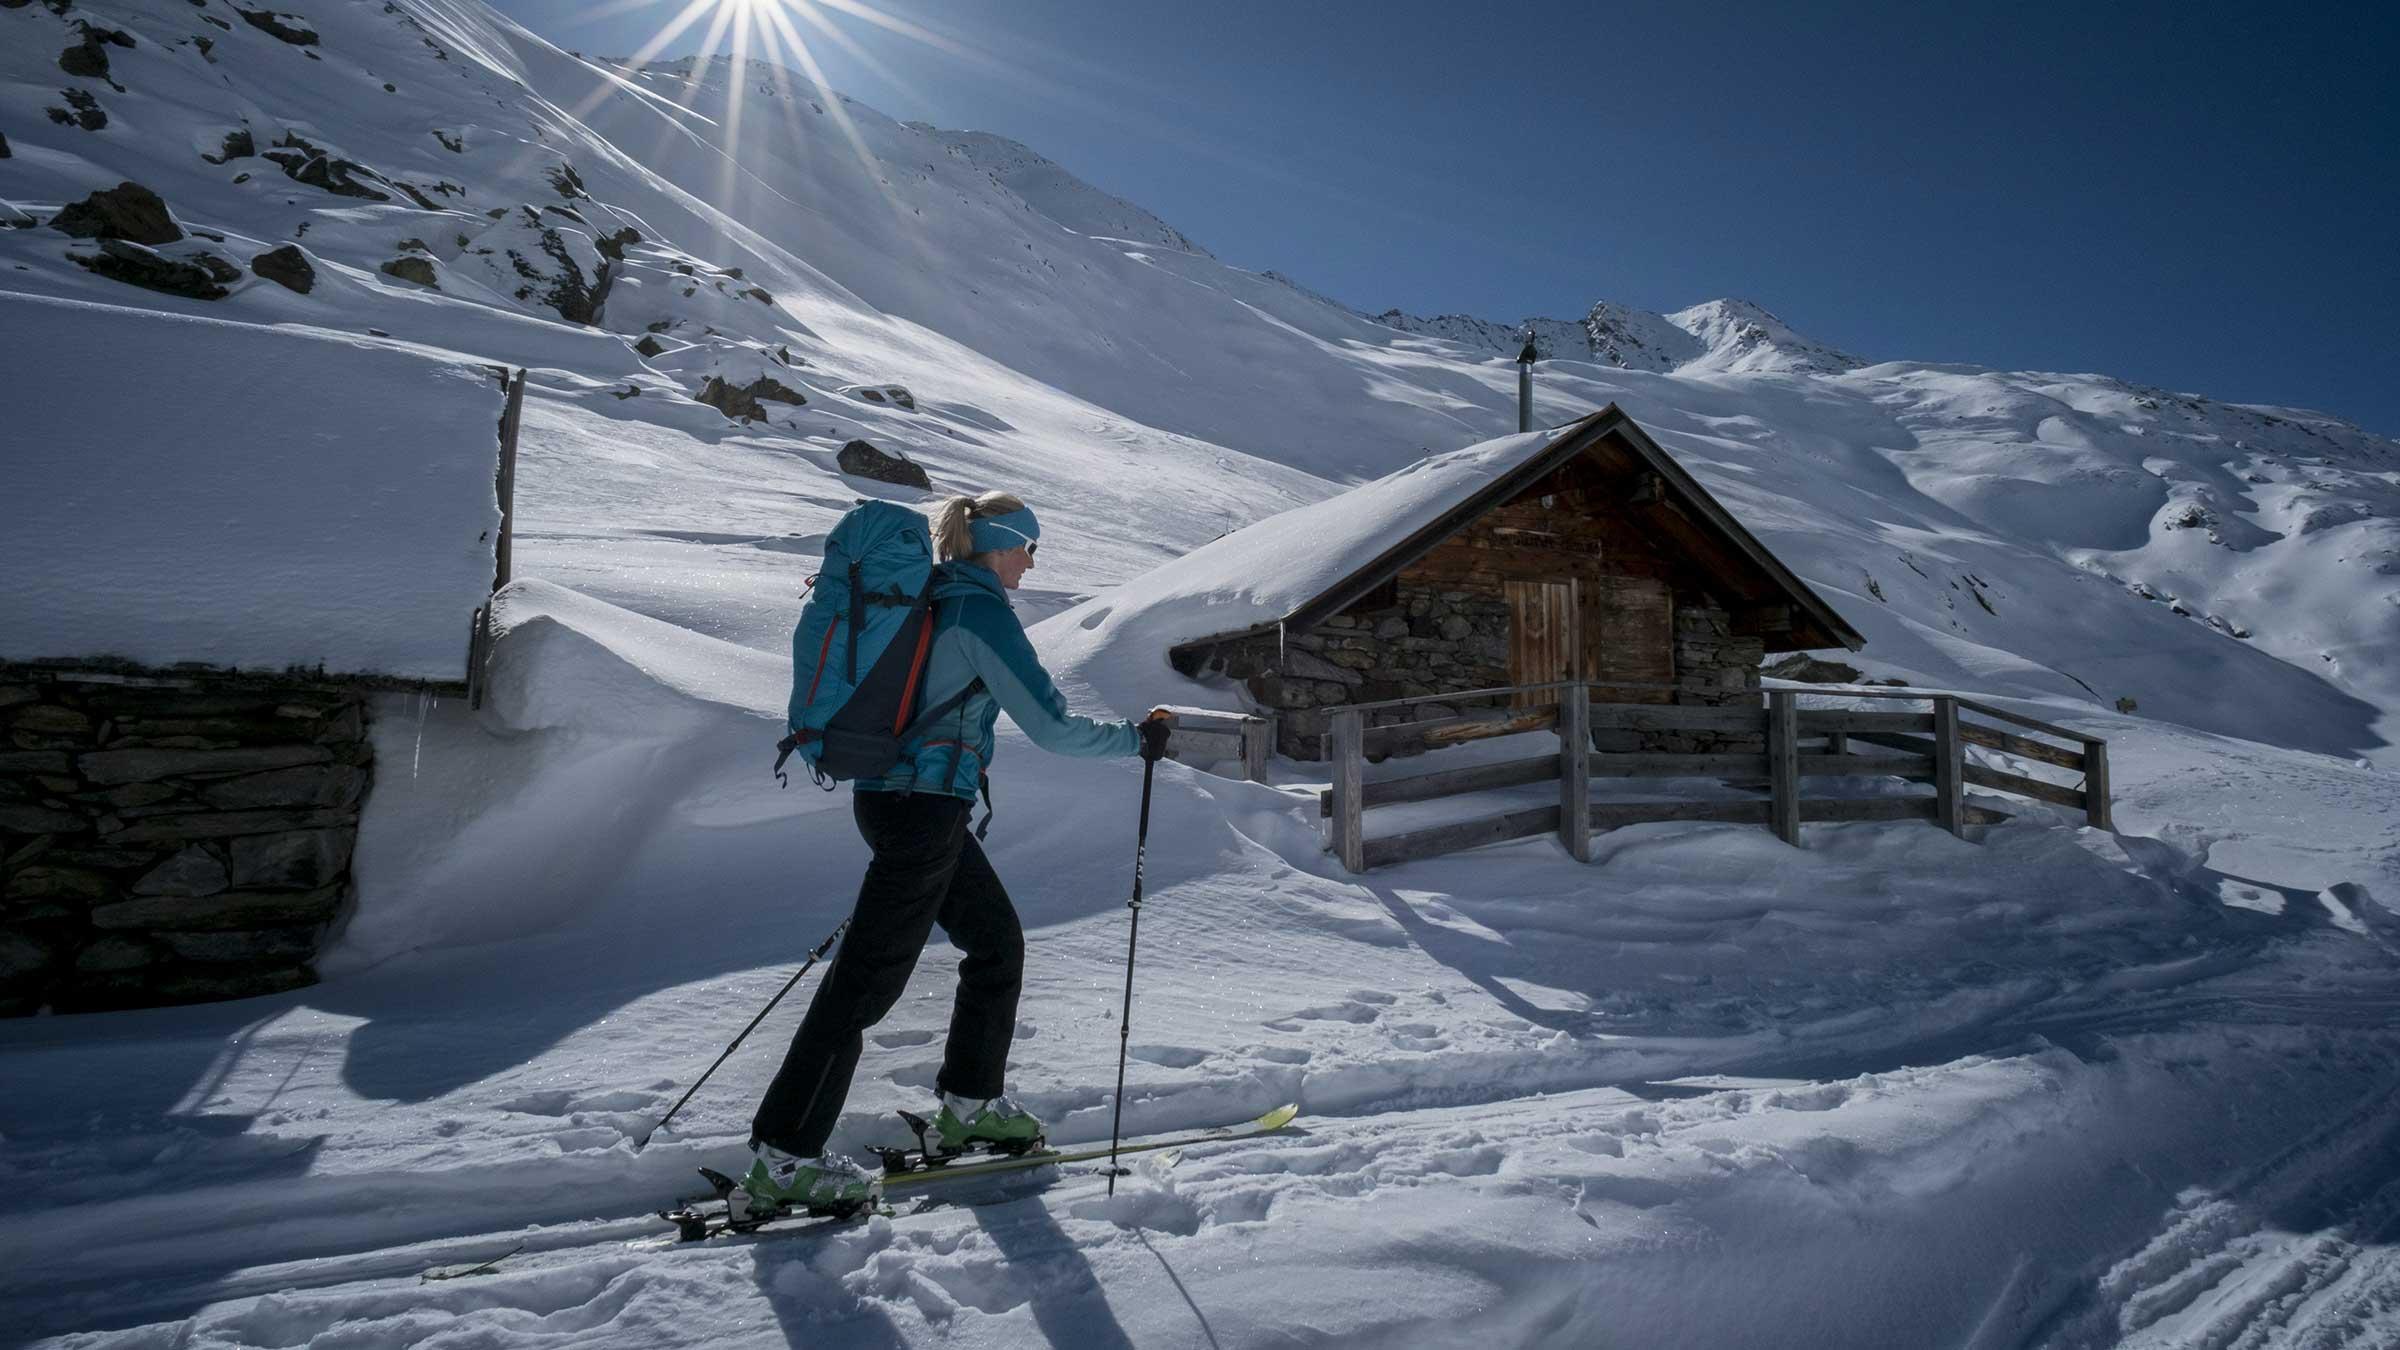 Skitourengeherin in Obergurgl-Hochgurgl - Powder Snow Week Obergurgl-Hochgurgl